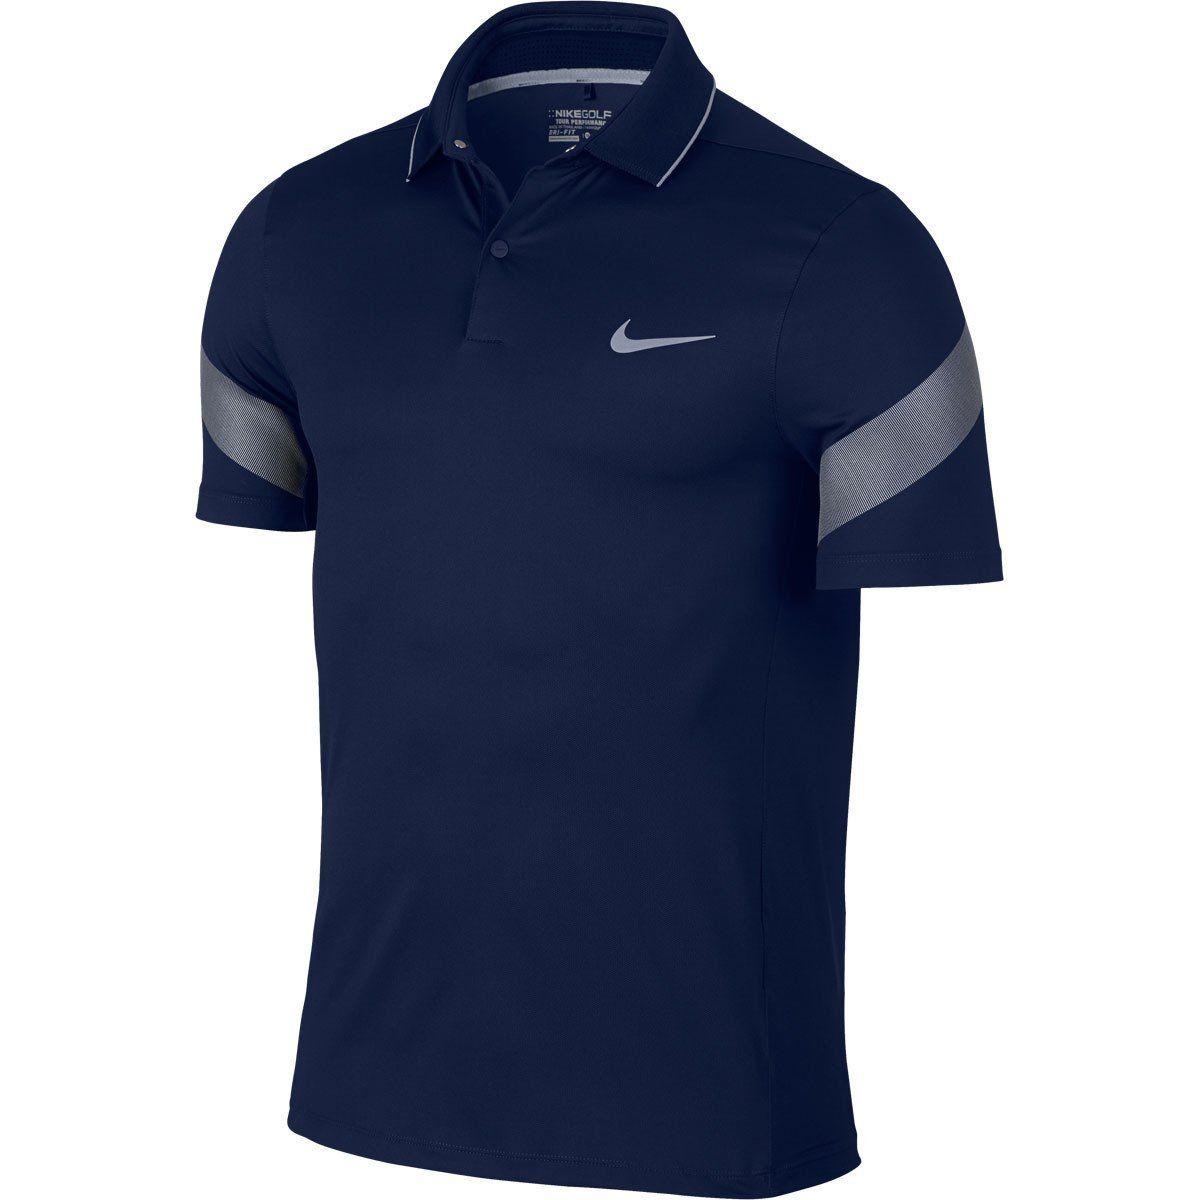 Nike Men's Midnight Navy/Photo Blue Momentum Framing